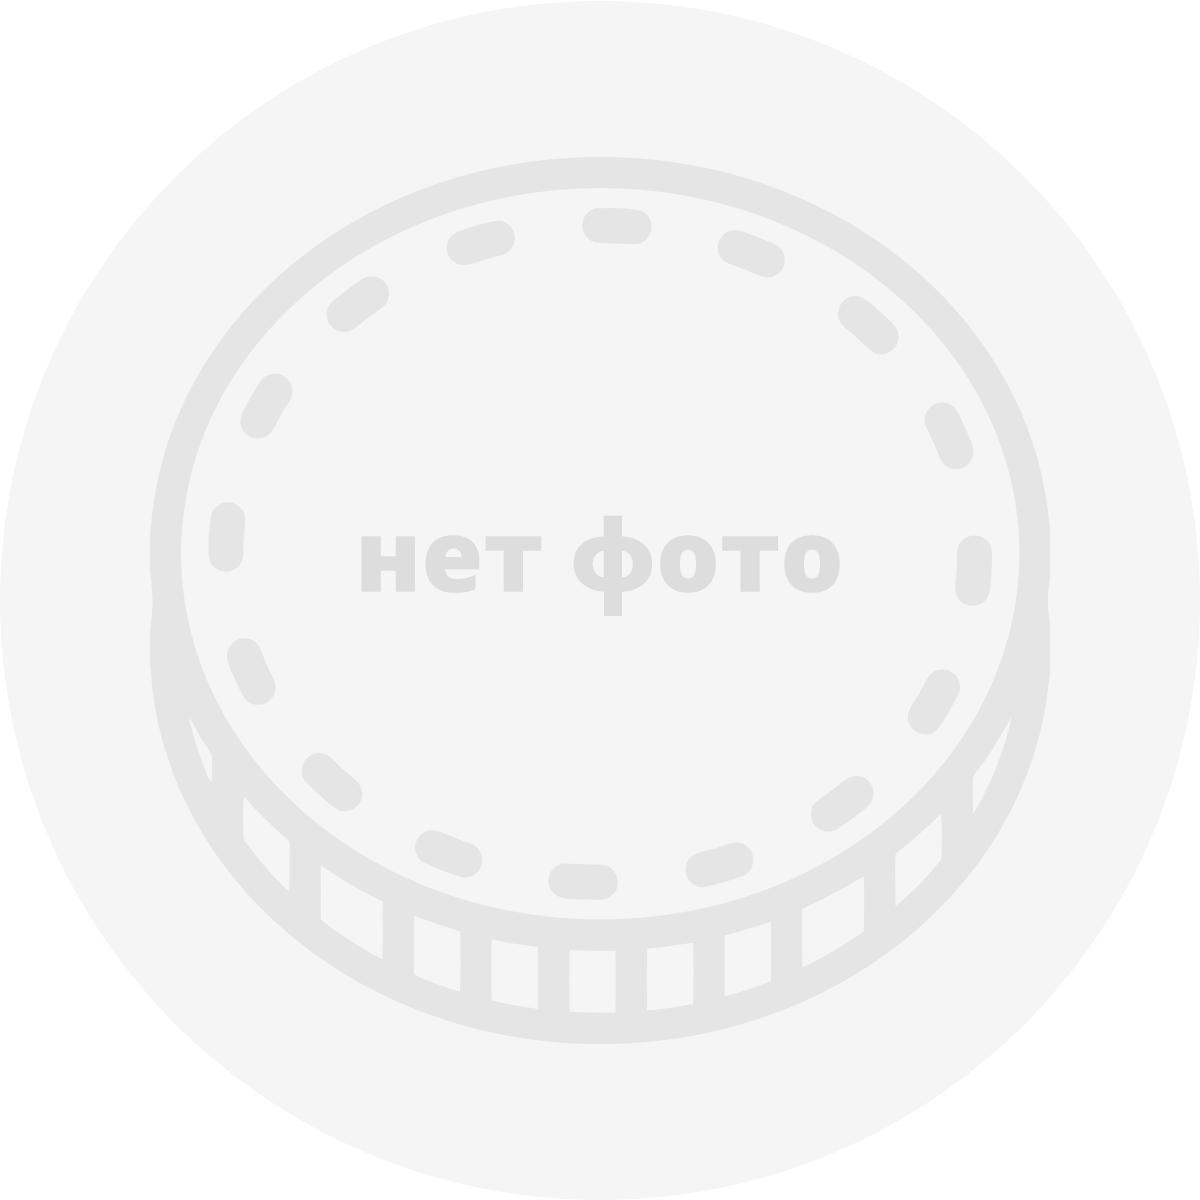 ФРГ, 10 пфеннигов (1971 г.)